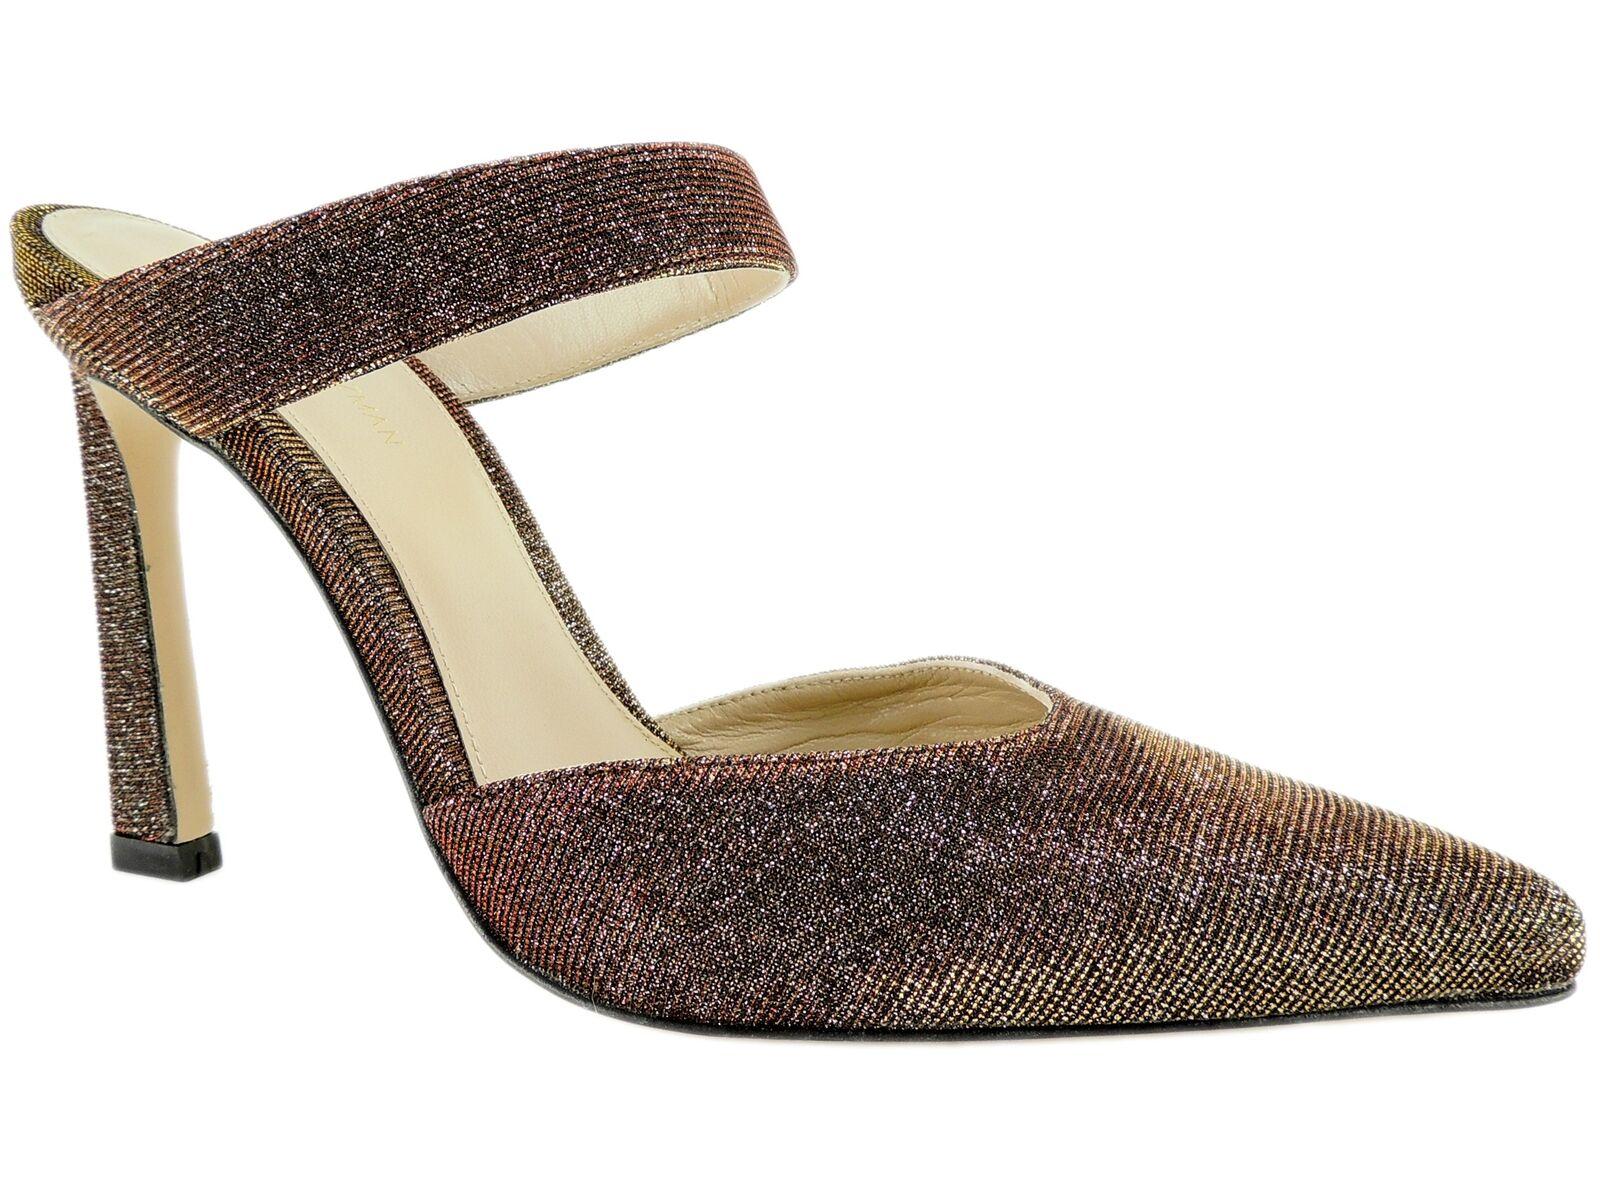 Stuart Weitzman Women's Eventually Suede Mules Bronze Nighttime Size 7.5 M